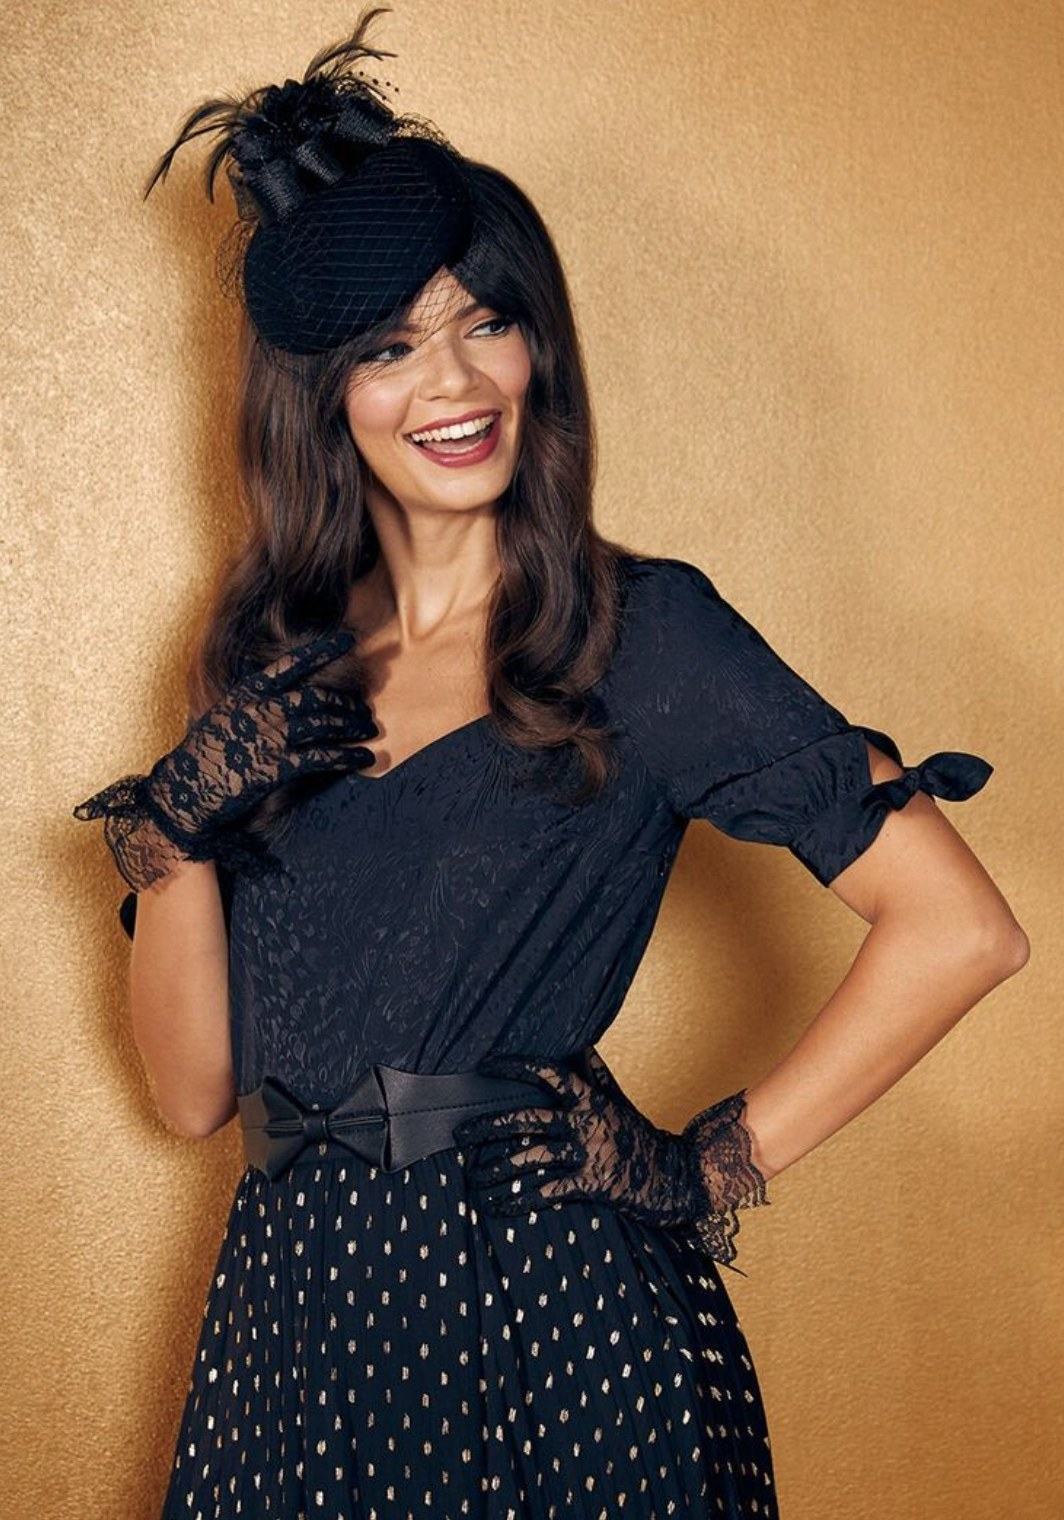 Model wearing the blouse in black